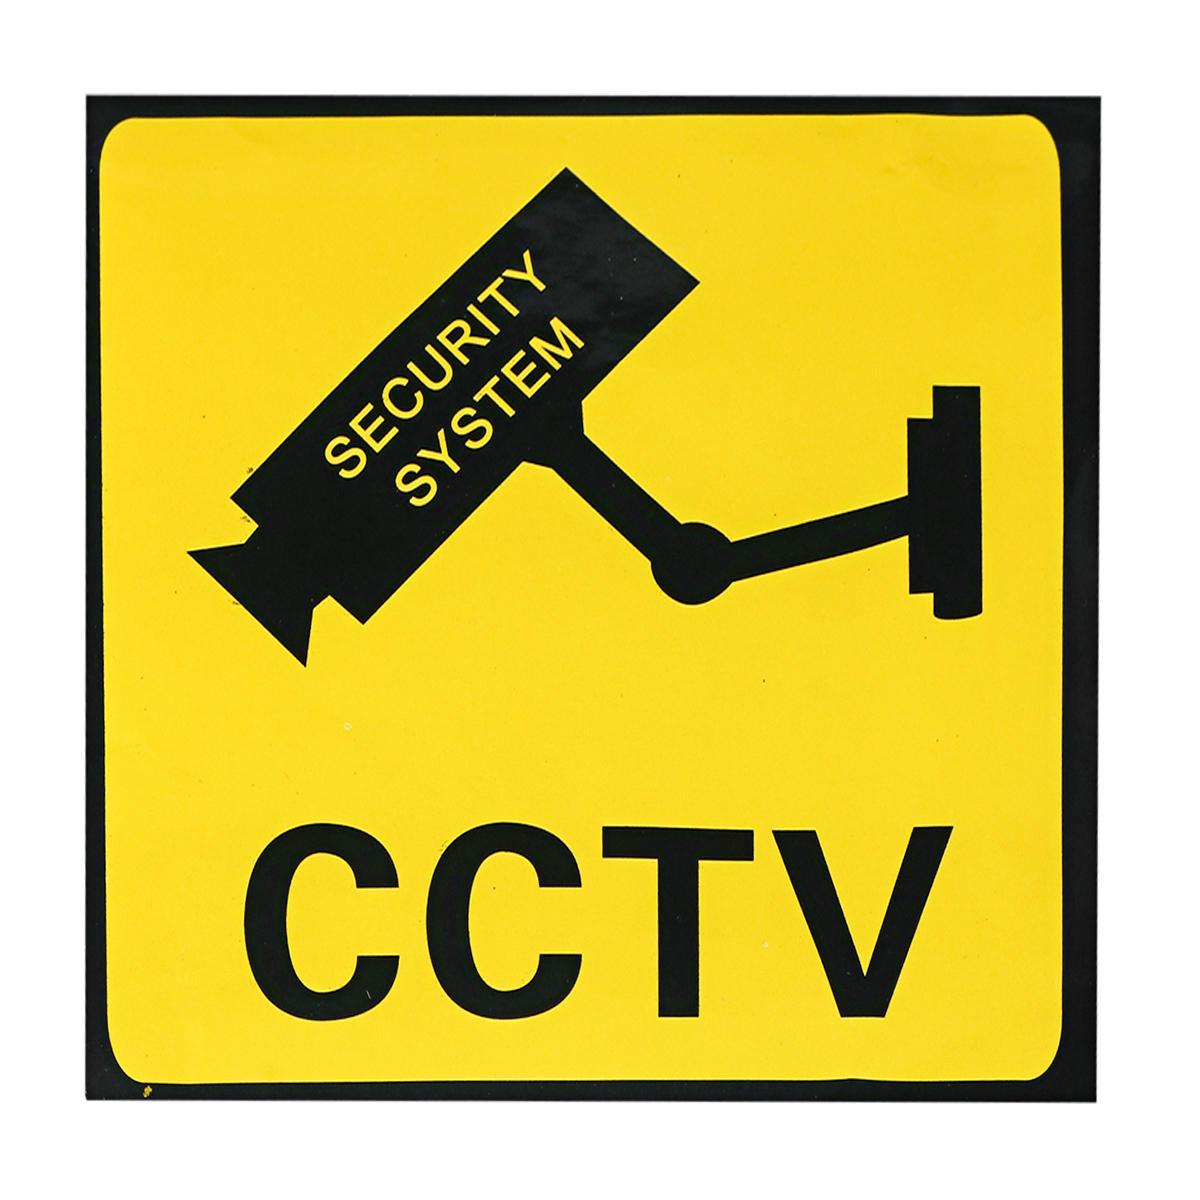 Home CCTV Surveillance Security Camera Sticker Warning Decal Signs 1 piece